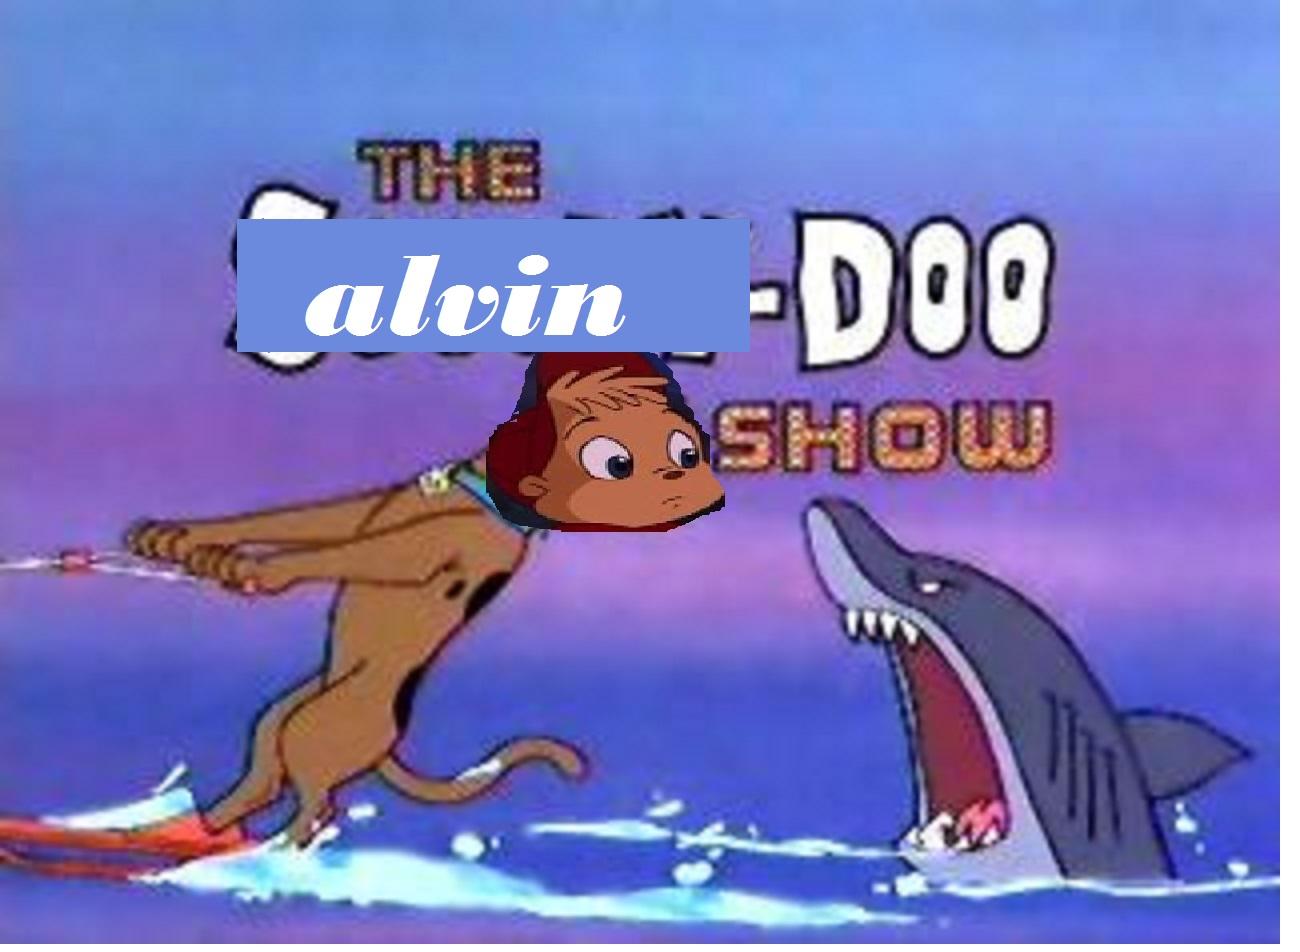 The Alvin Doo Show